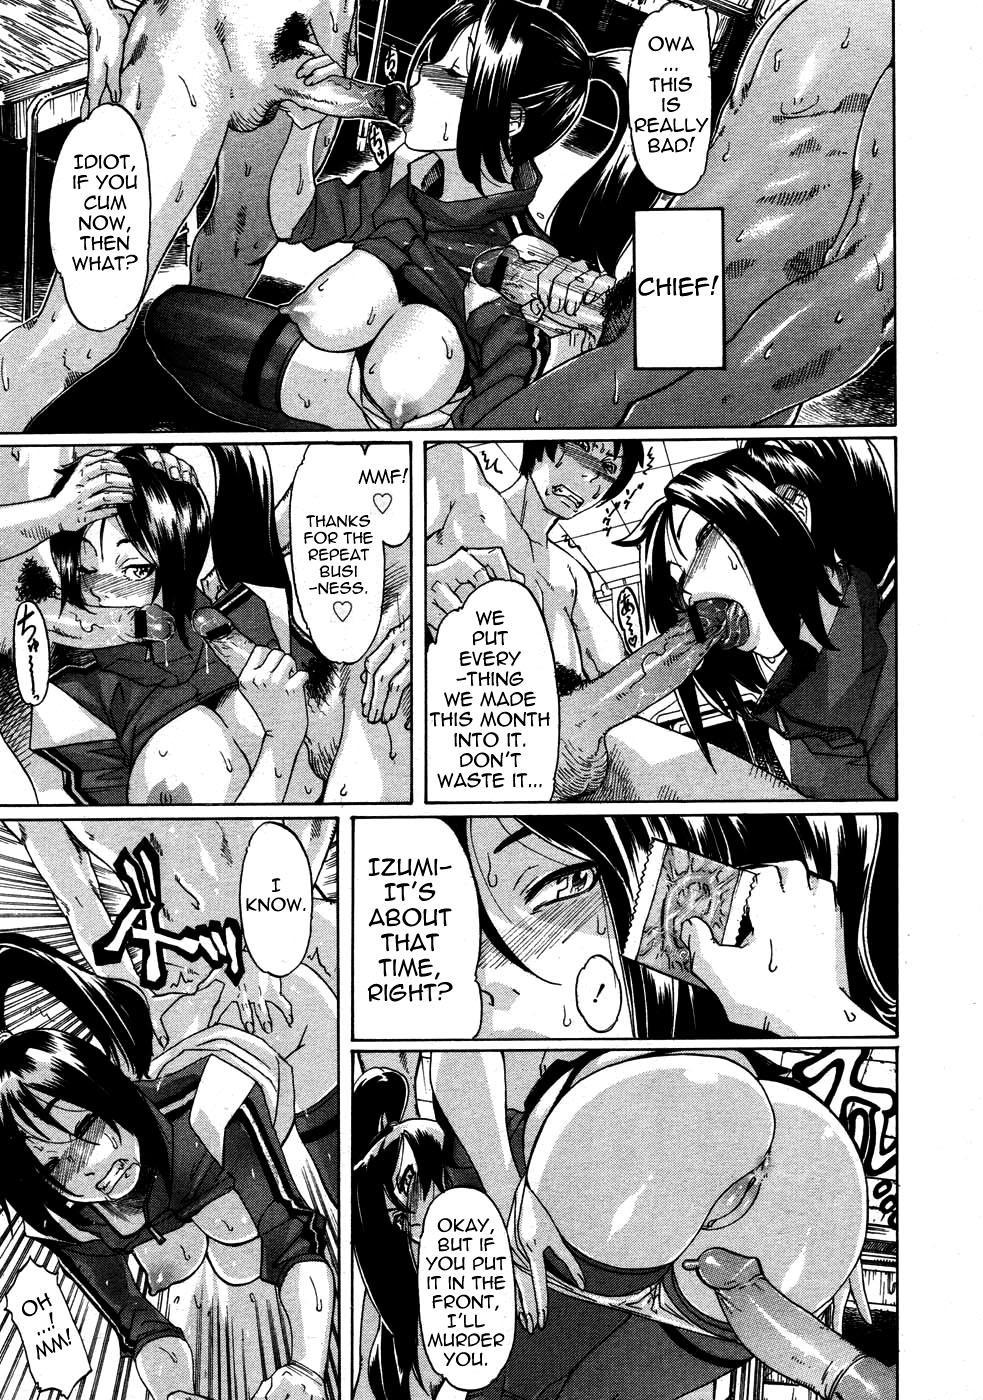 [Royal Koyanagi] Milky Shot! (School Is Crazy these Days) Ch.1-2 [English] 8